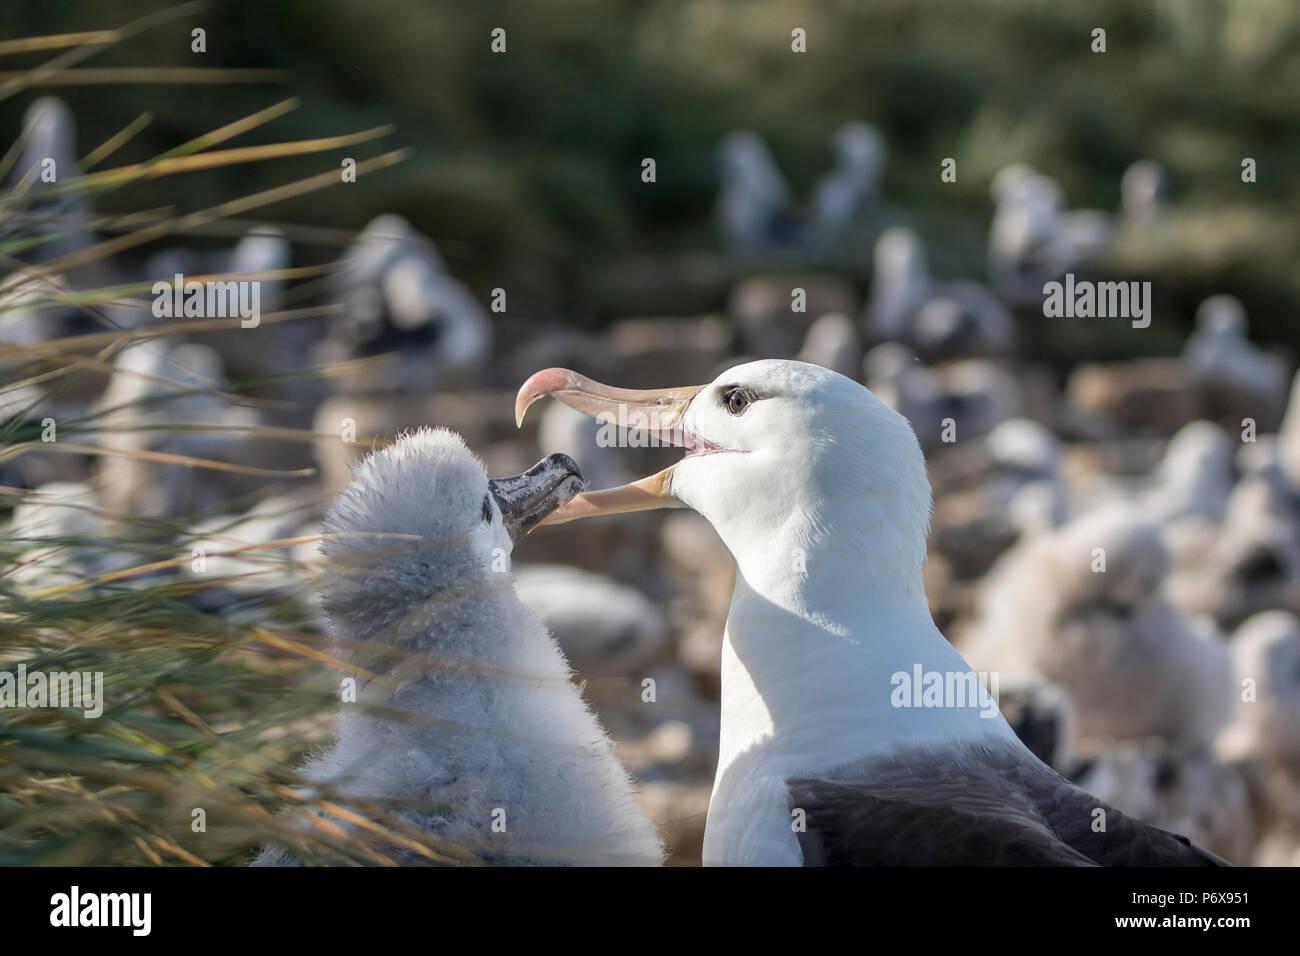 Adult black-browed albatross regurgitating food to feed large fluffy chick on nest at Steeple Jason Island, Falkland Islands Stock Photo